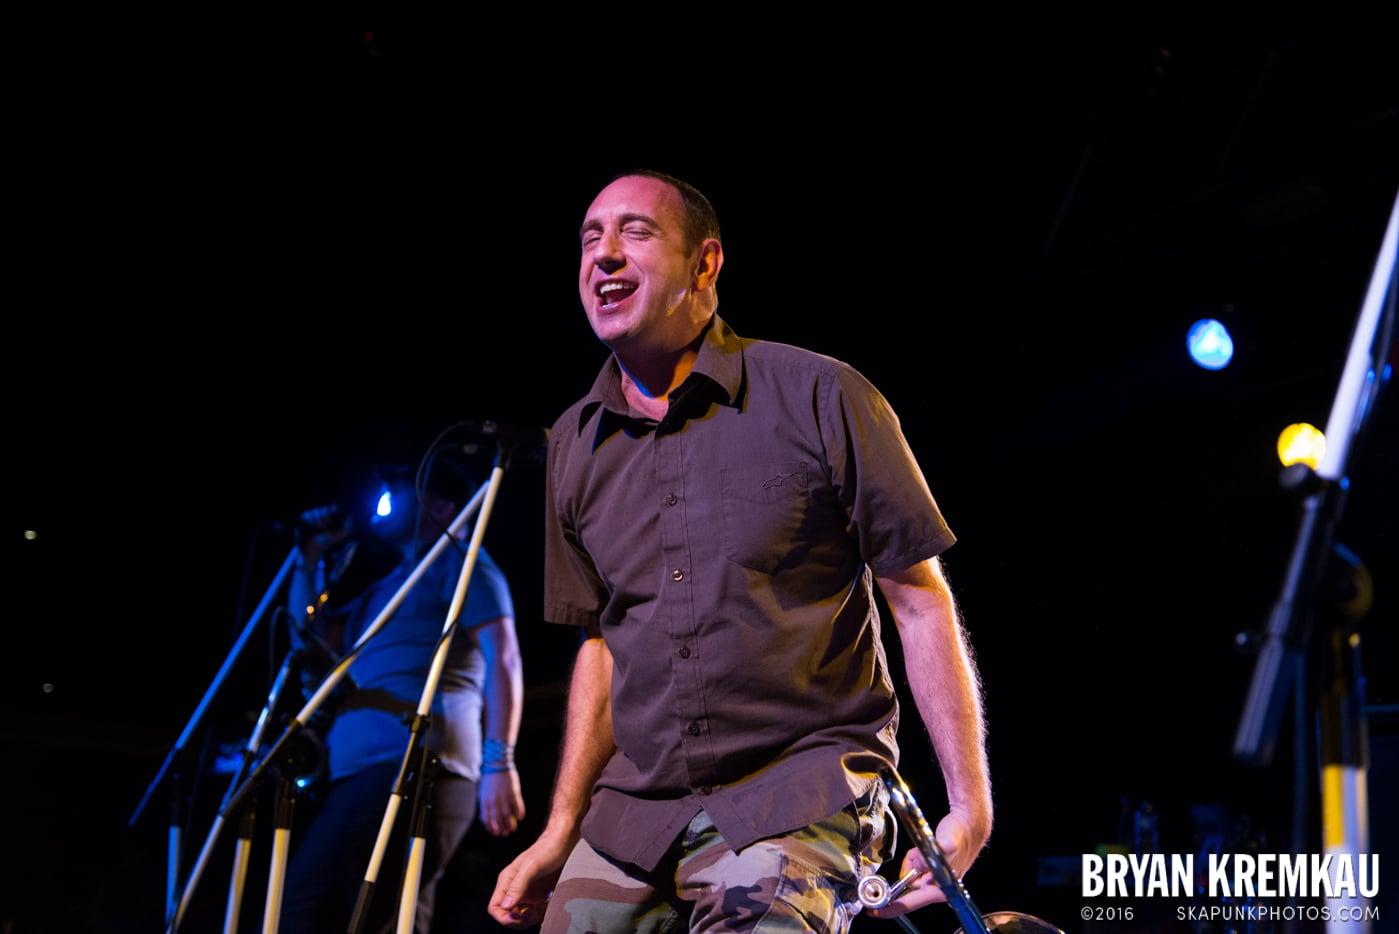 Less Than Jake @ Starland Ballroom, Sayreville, NJ - 11.9.13 (26)